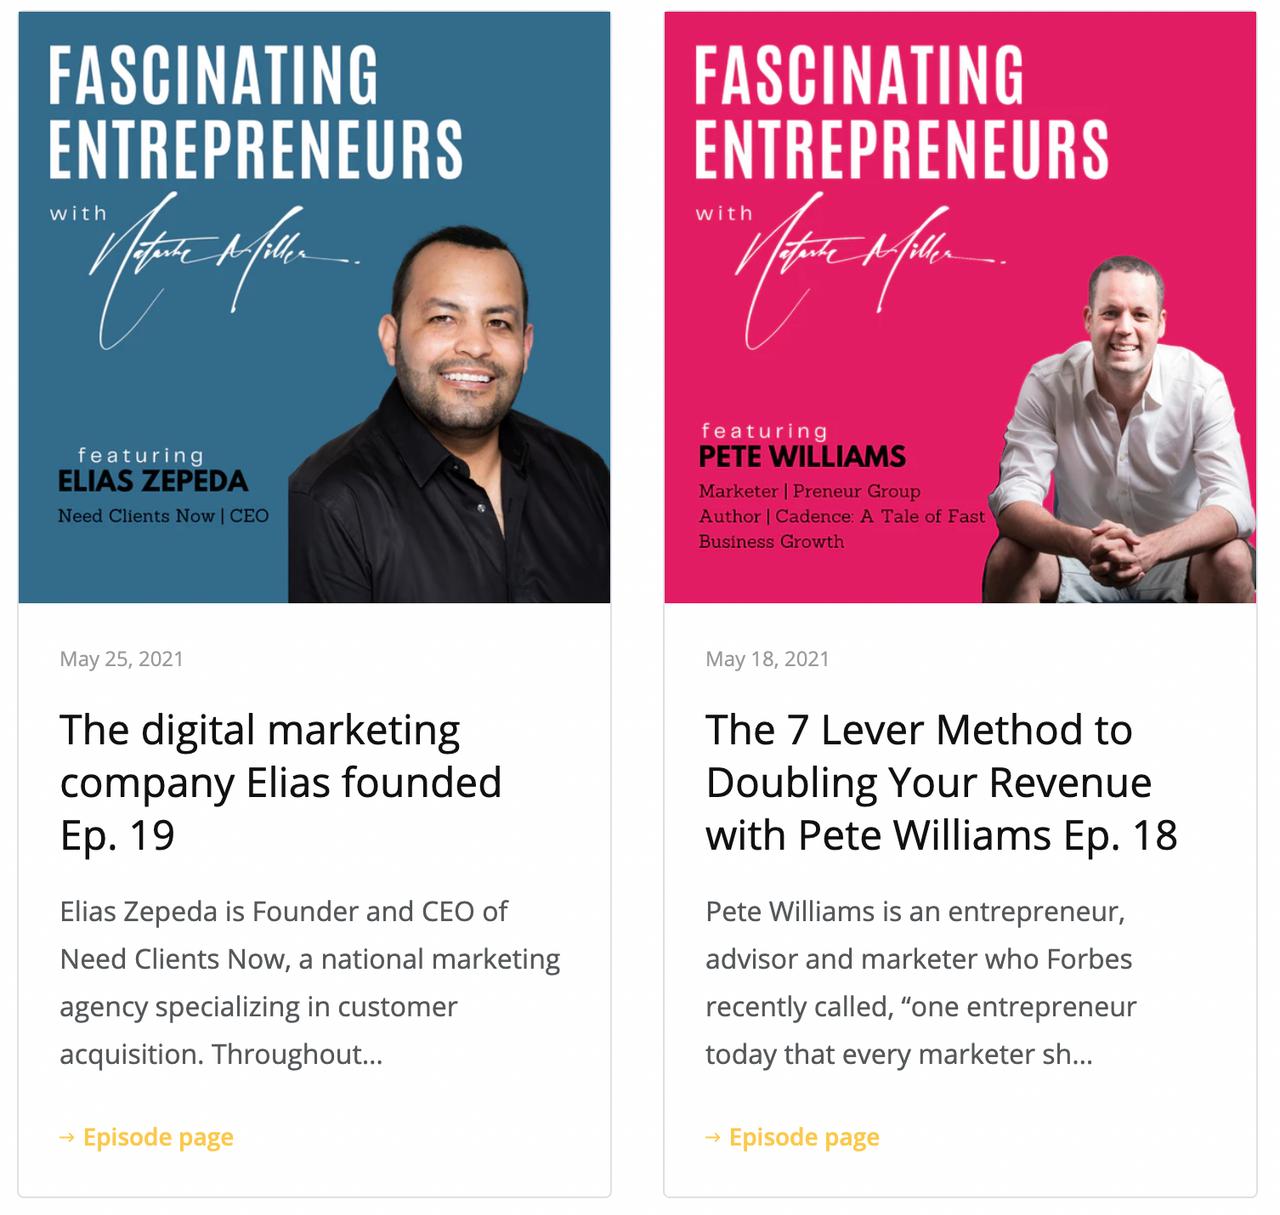 Fascinating Entrepreneurs Website